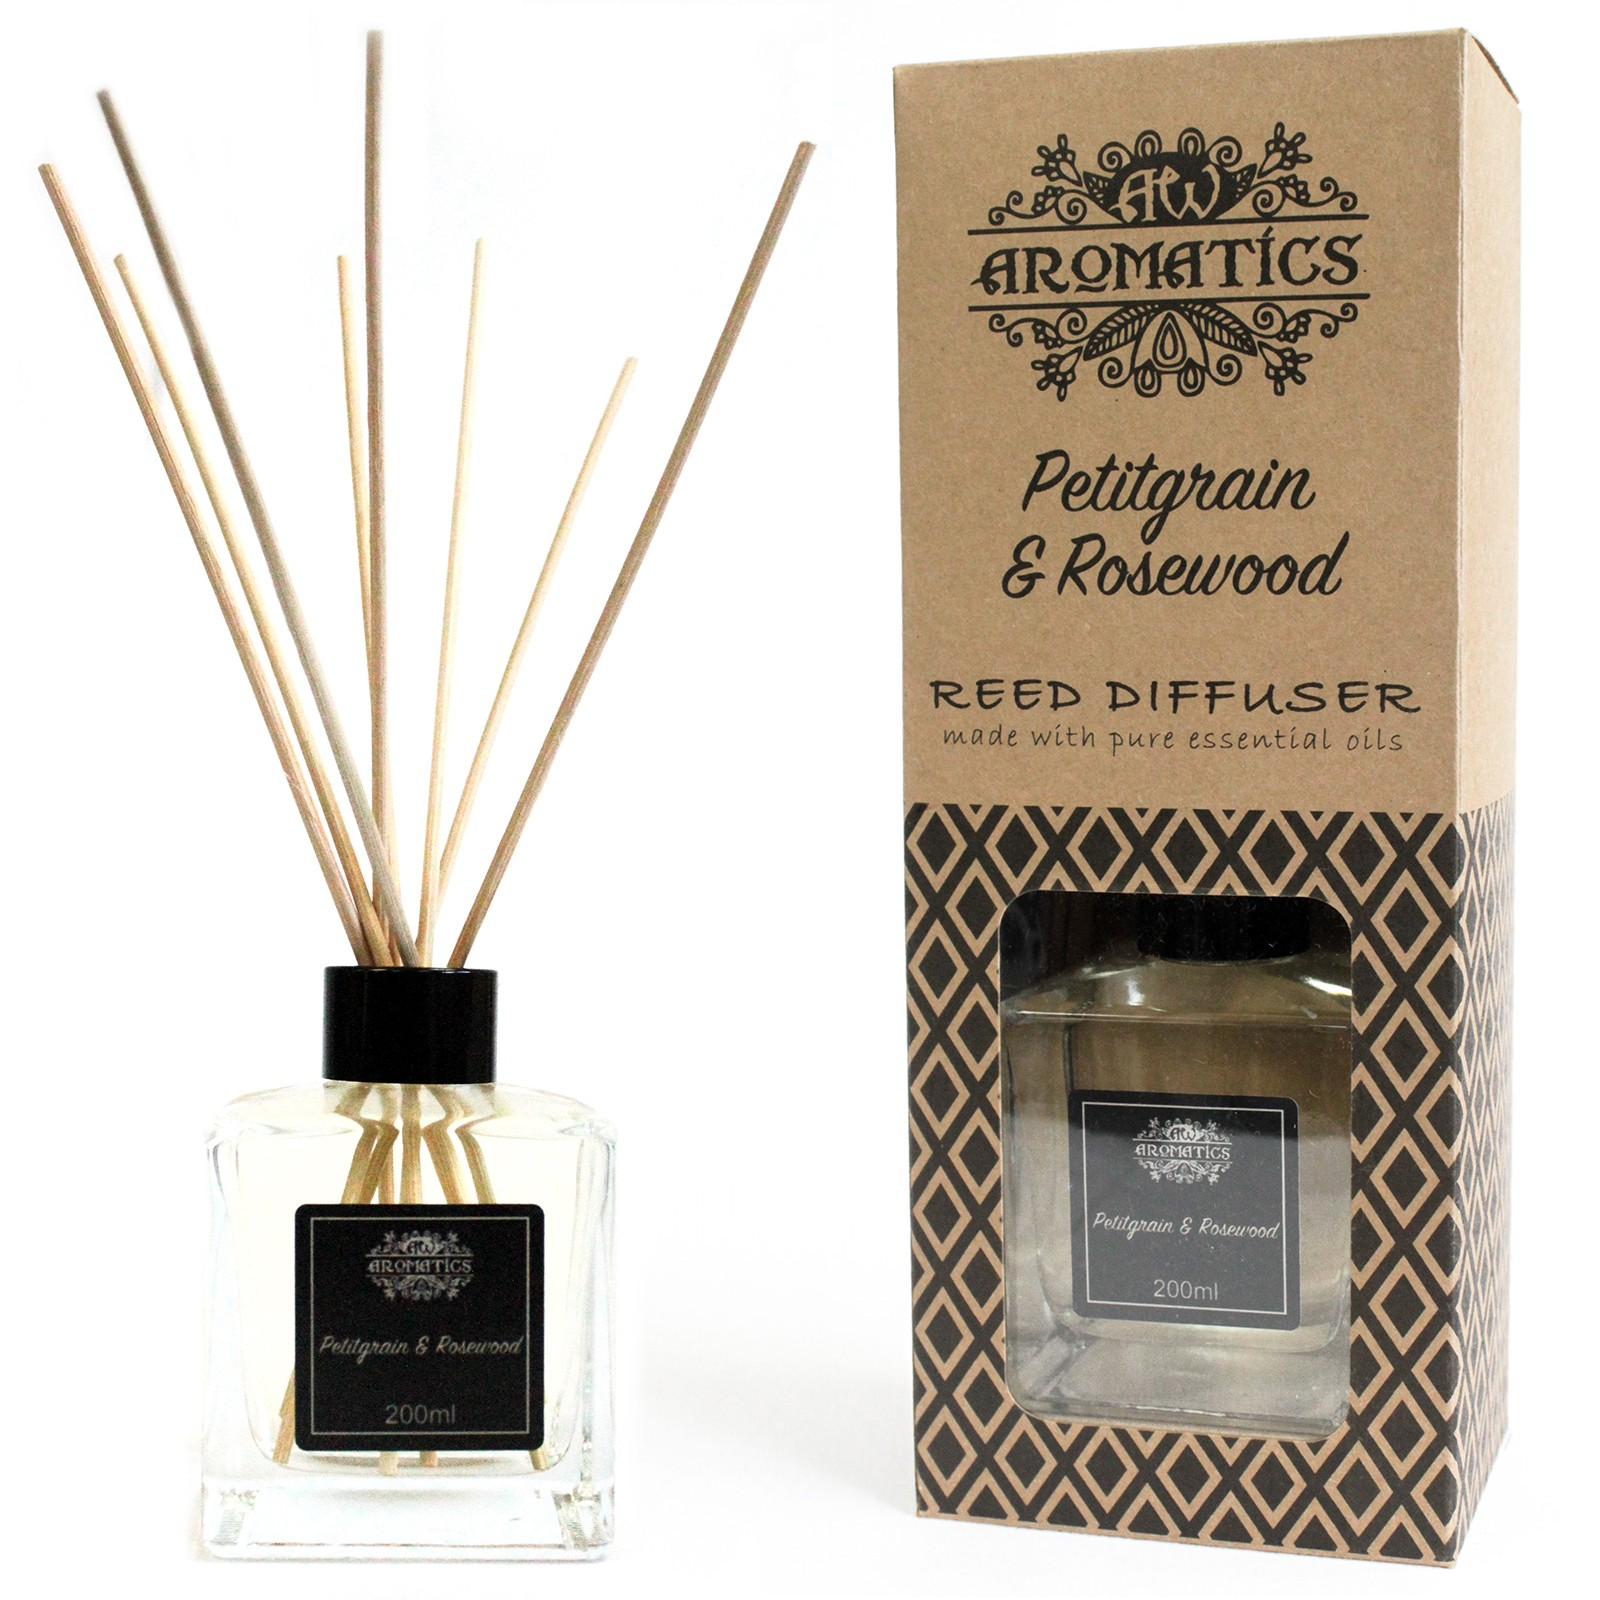 200ml Petitgrain and Rosewood Essential Oil Reed Diffuser